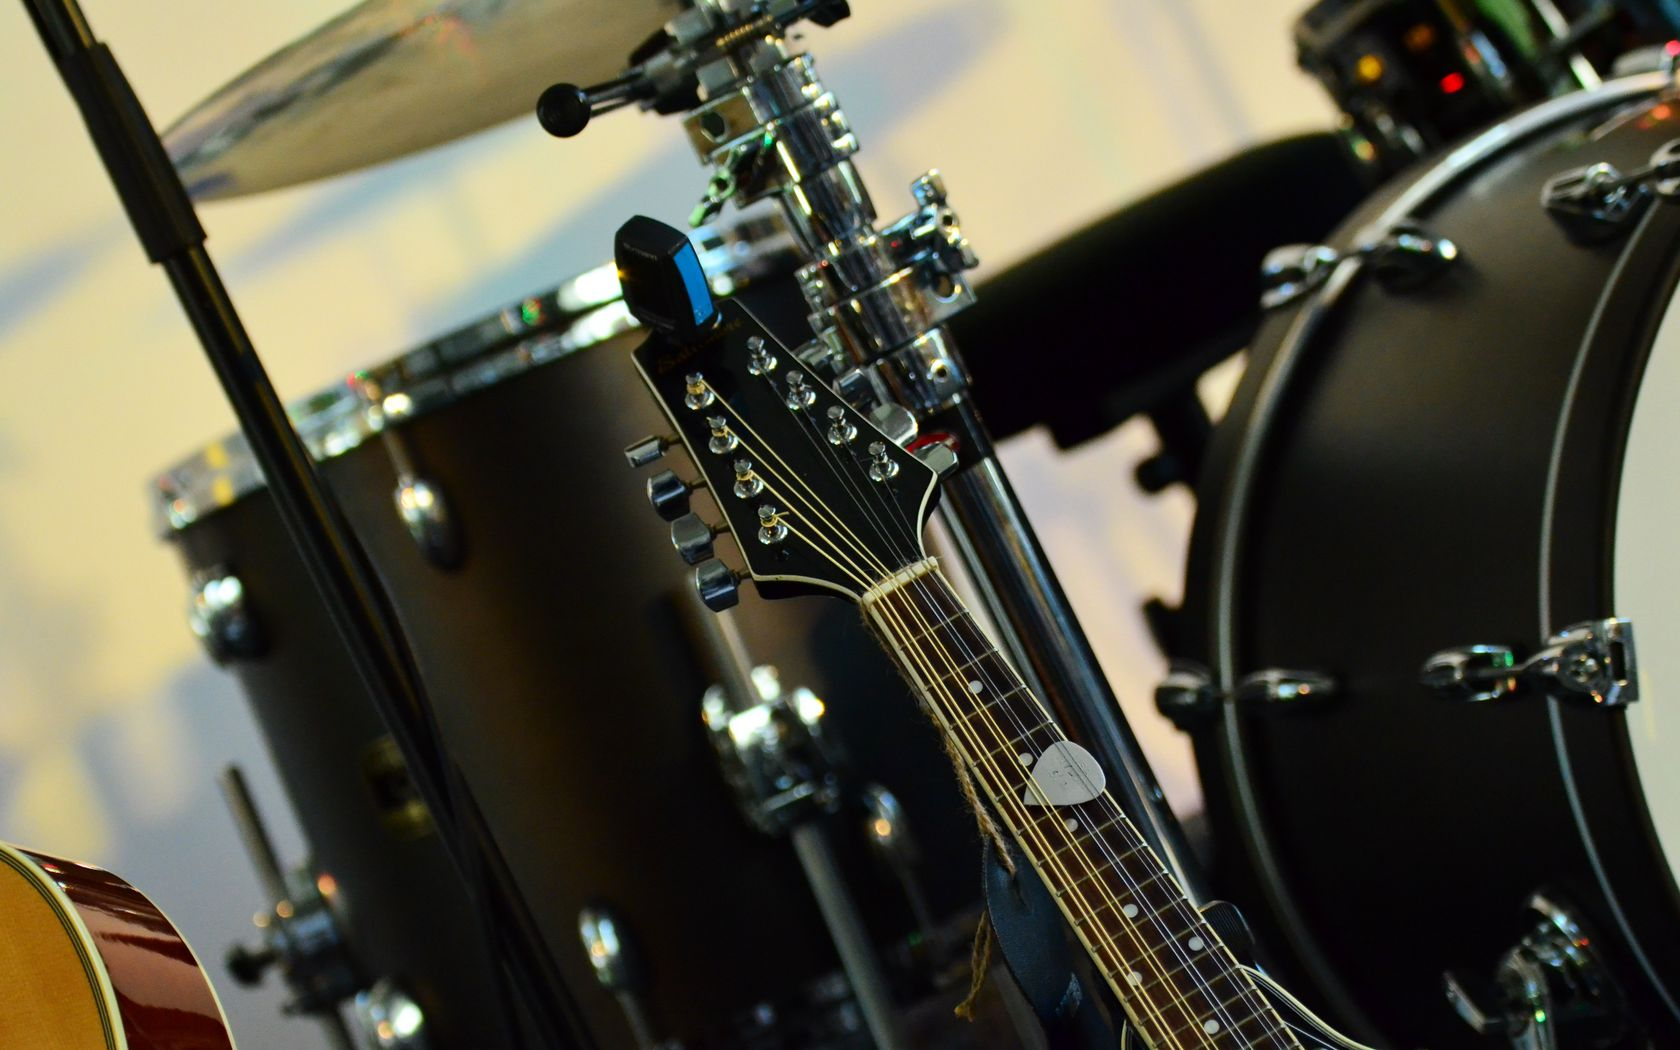 1680x1050 Wallpaper musical instrument, music, percussion, guitar